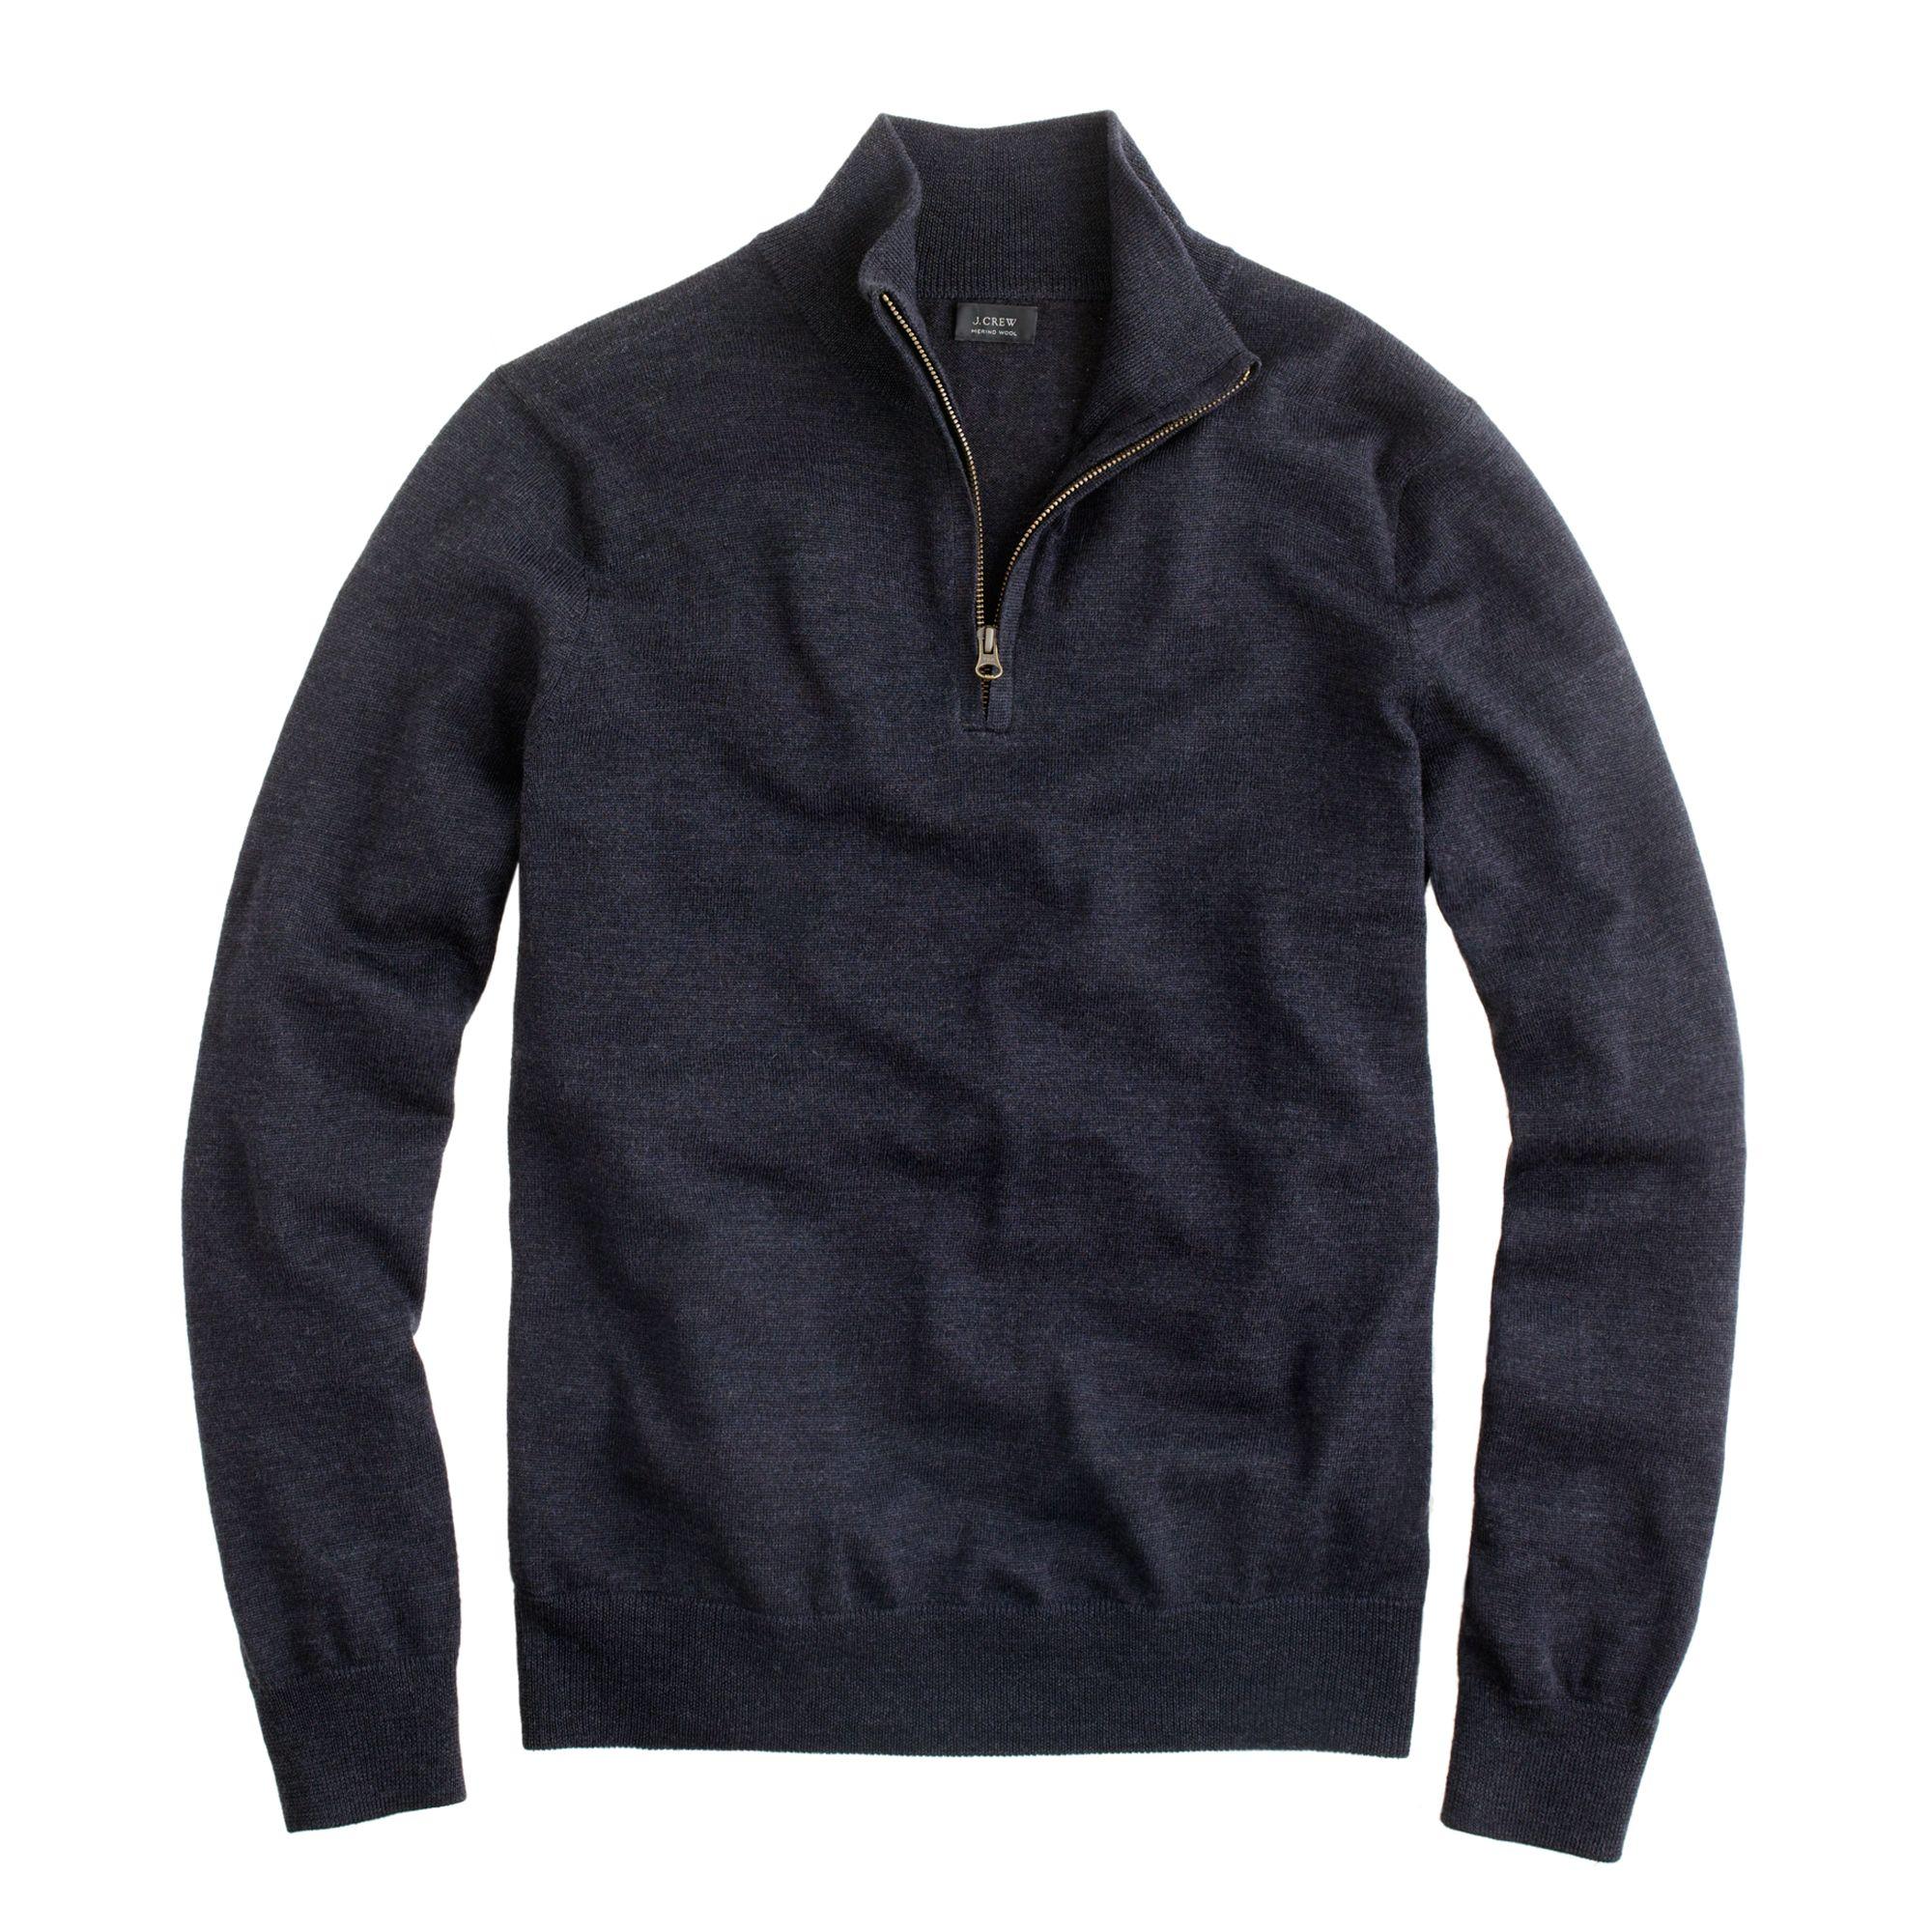 Merino Wool Half Zip Sweater - Long Sweater Jacket